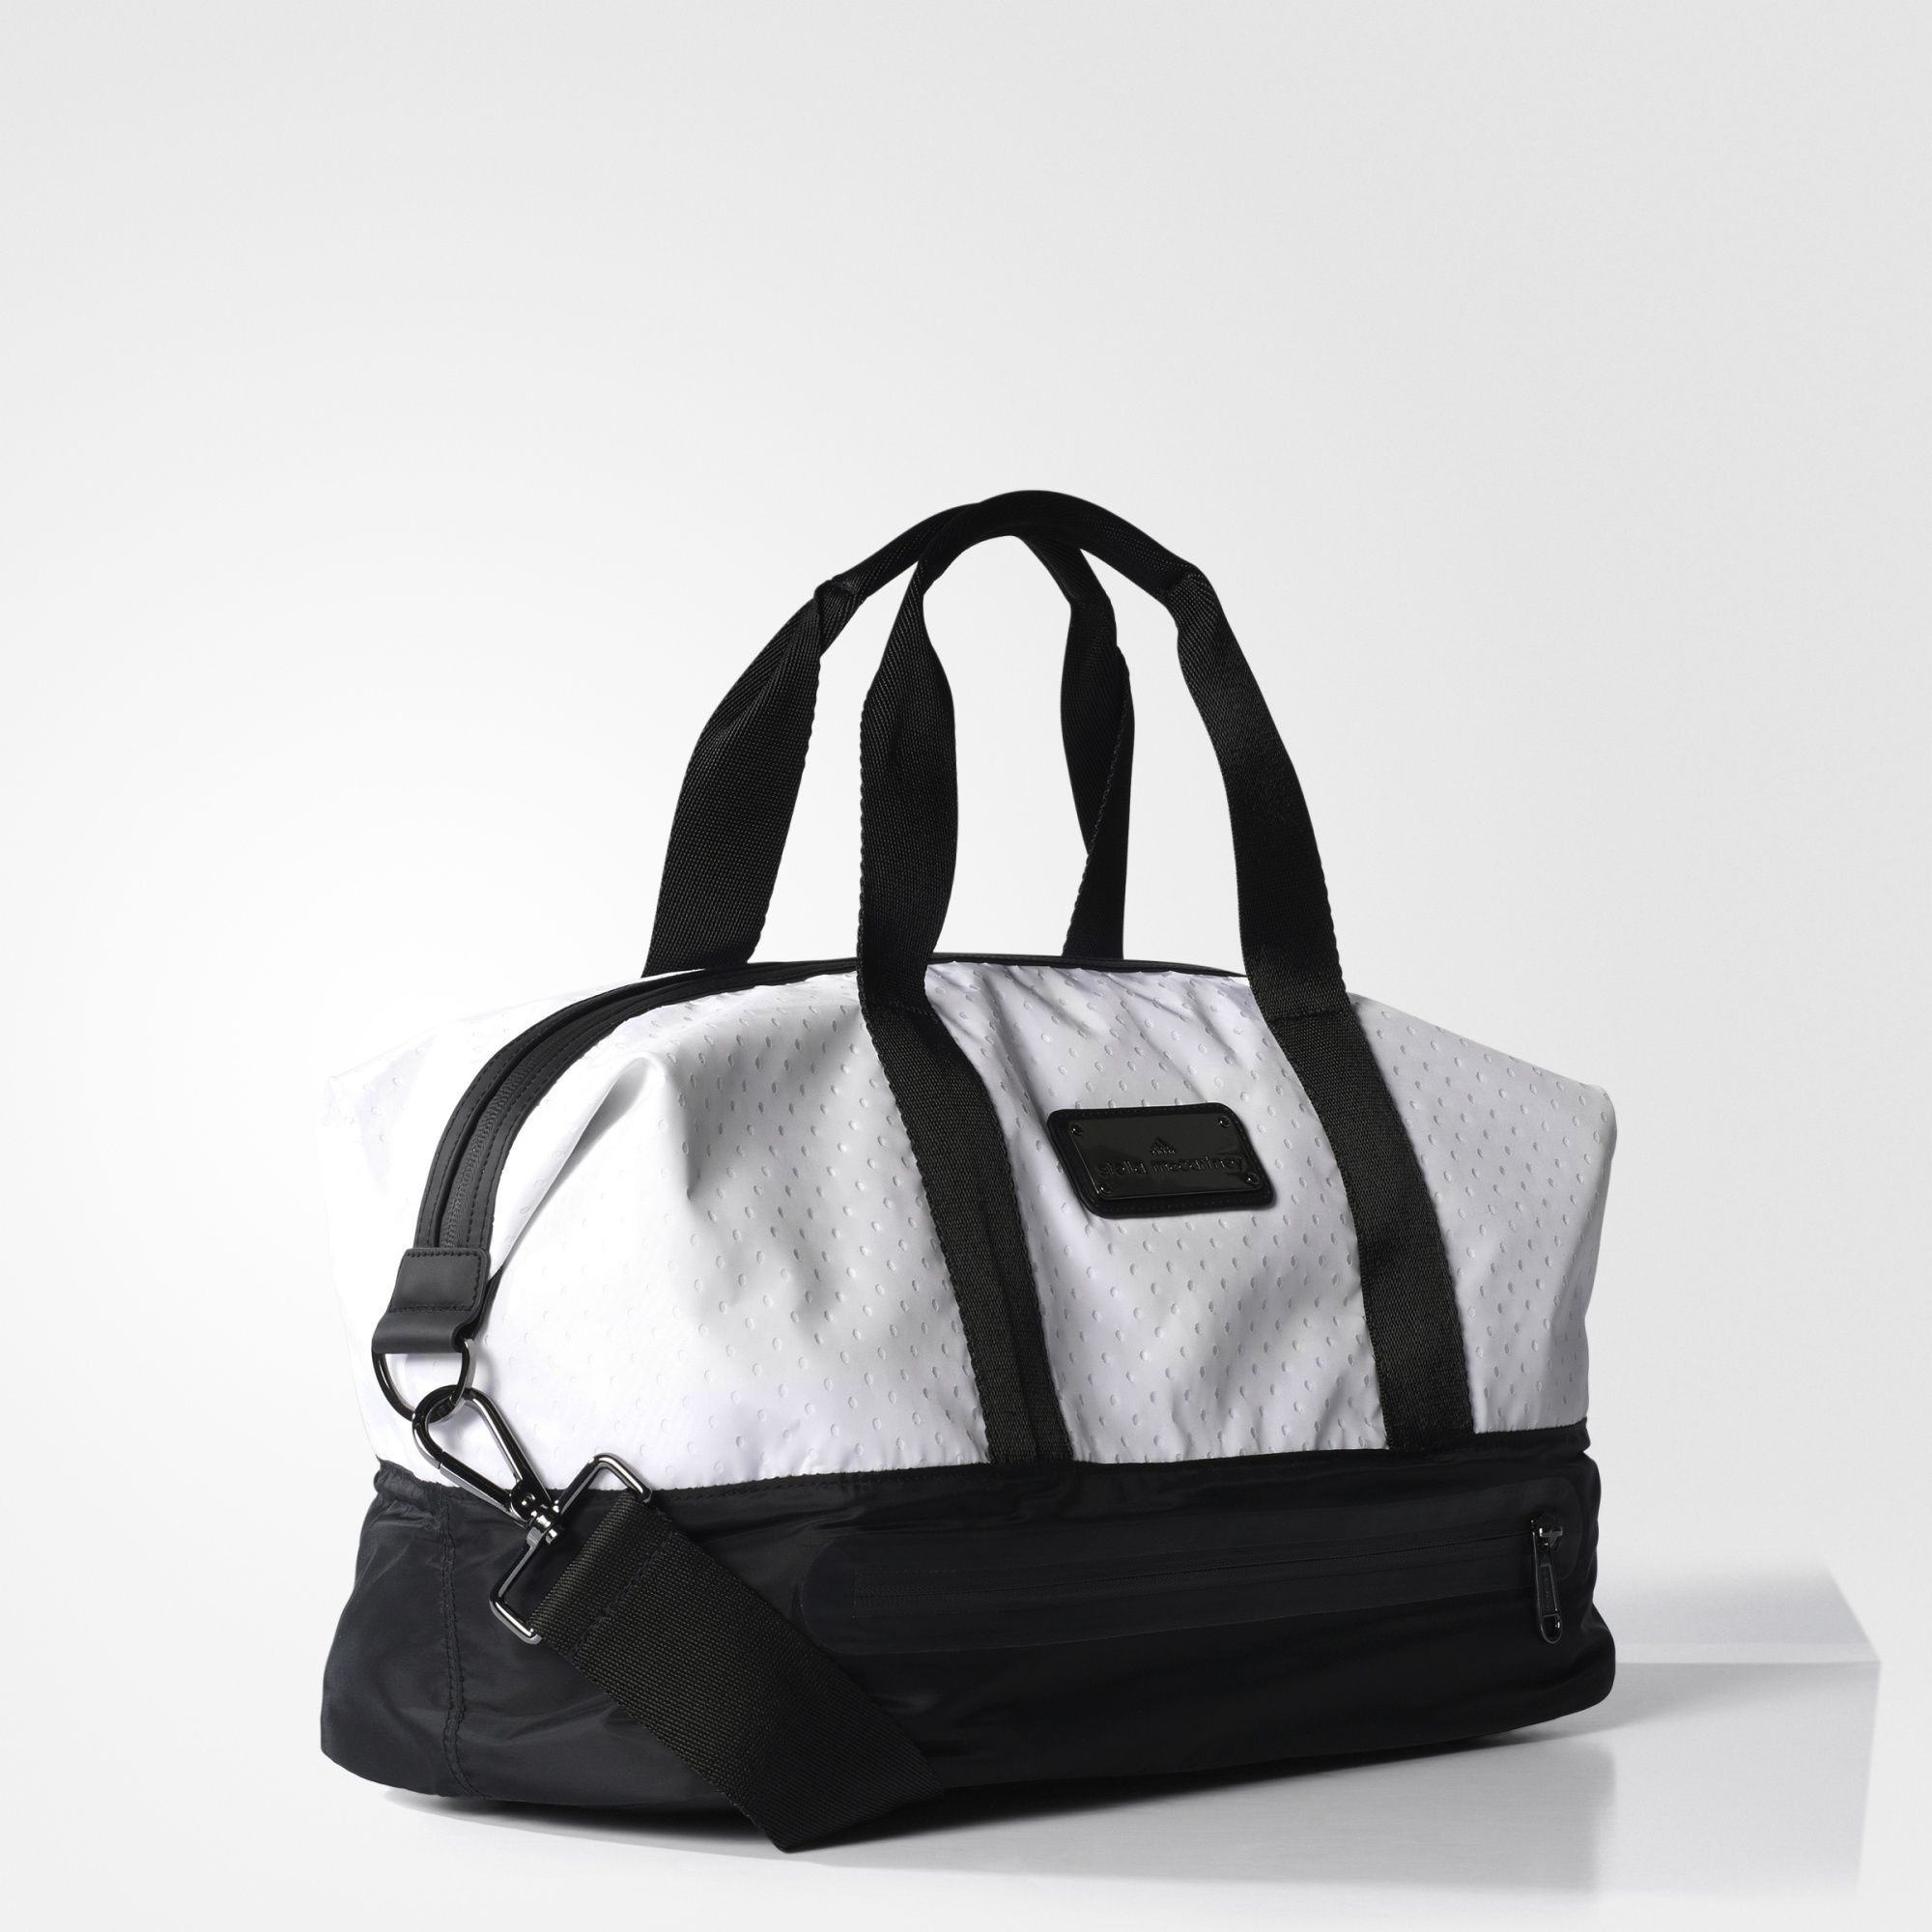 Adidas Small Gym Bag Small Gym Bag Gym Bag Bags